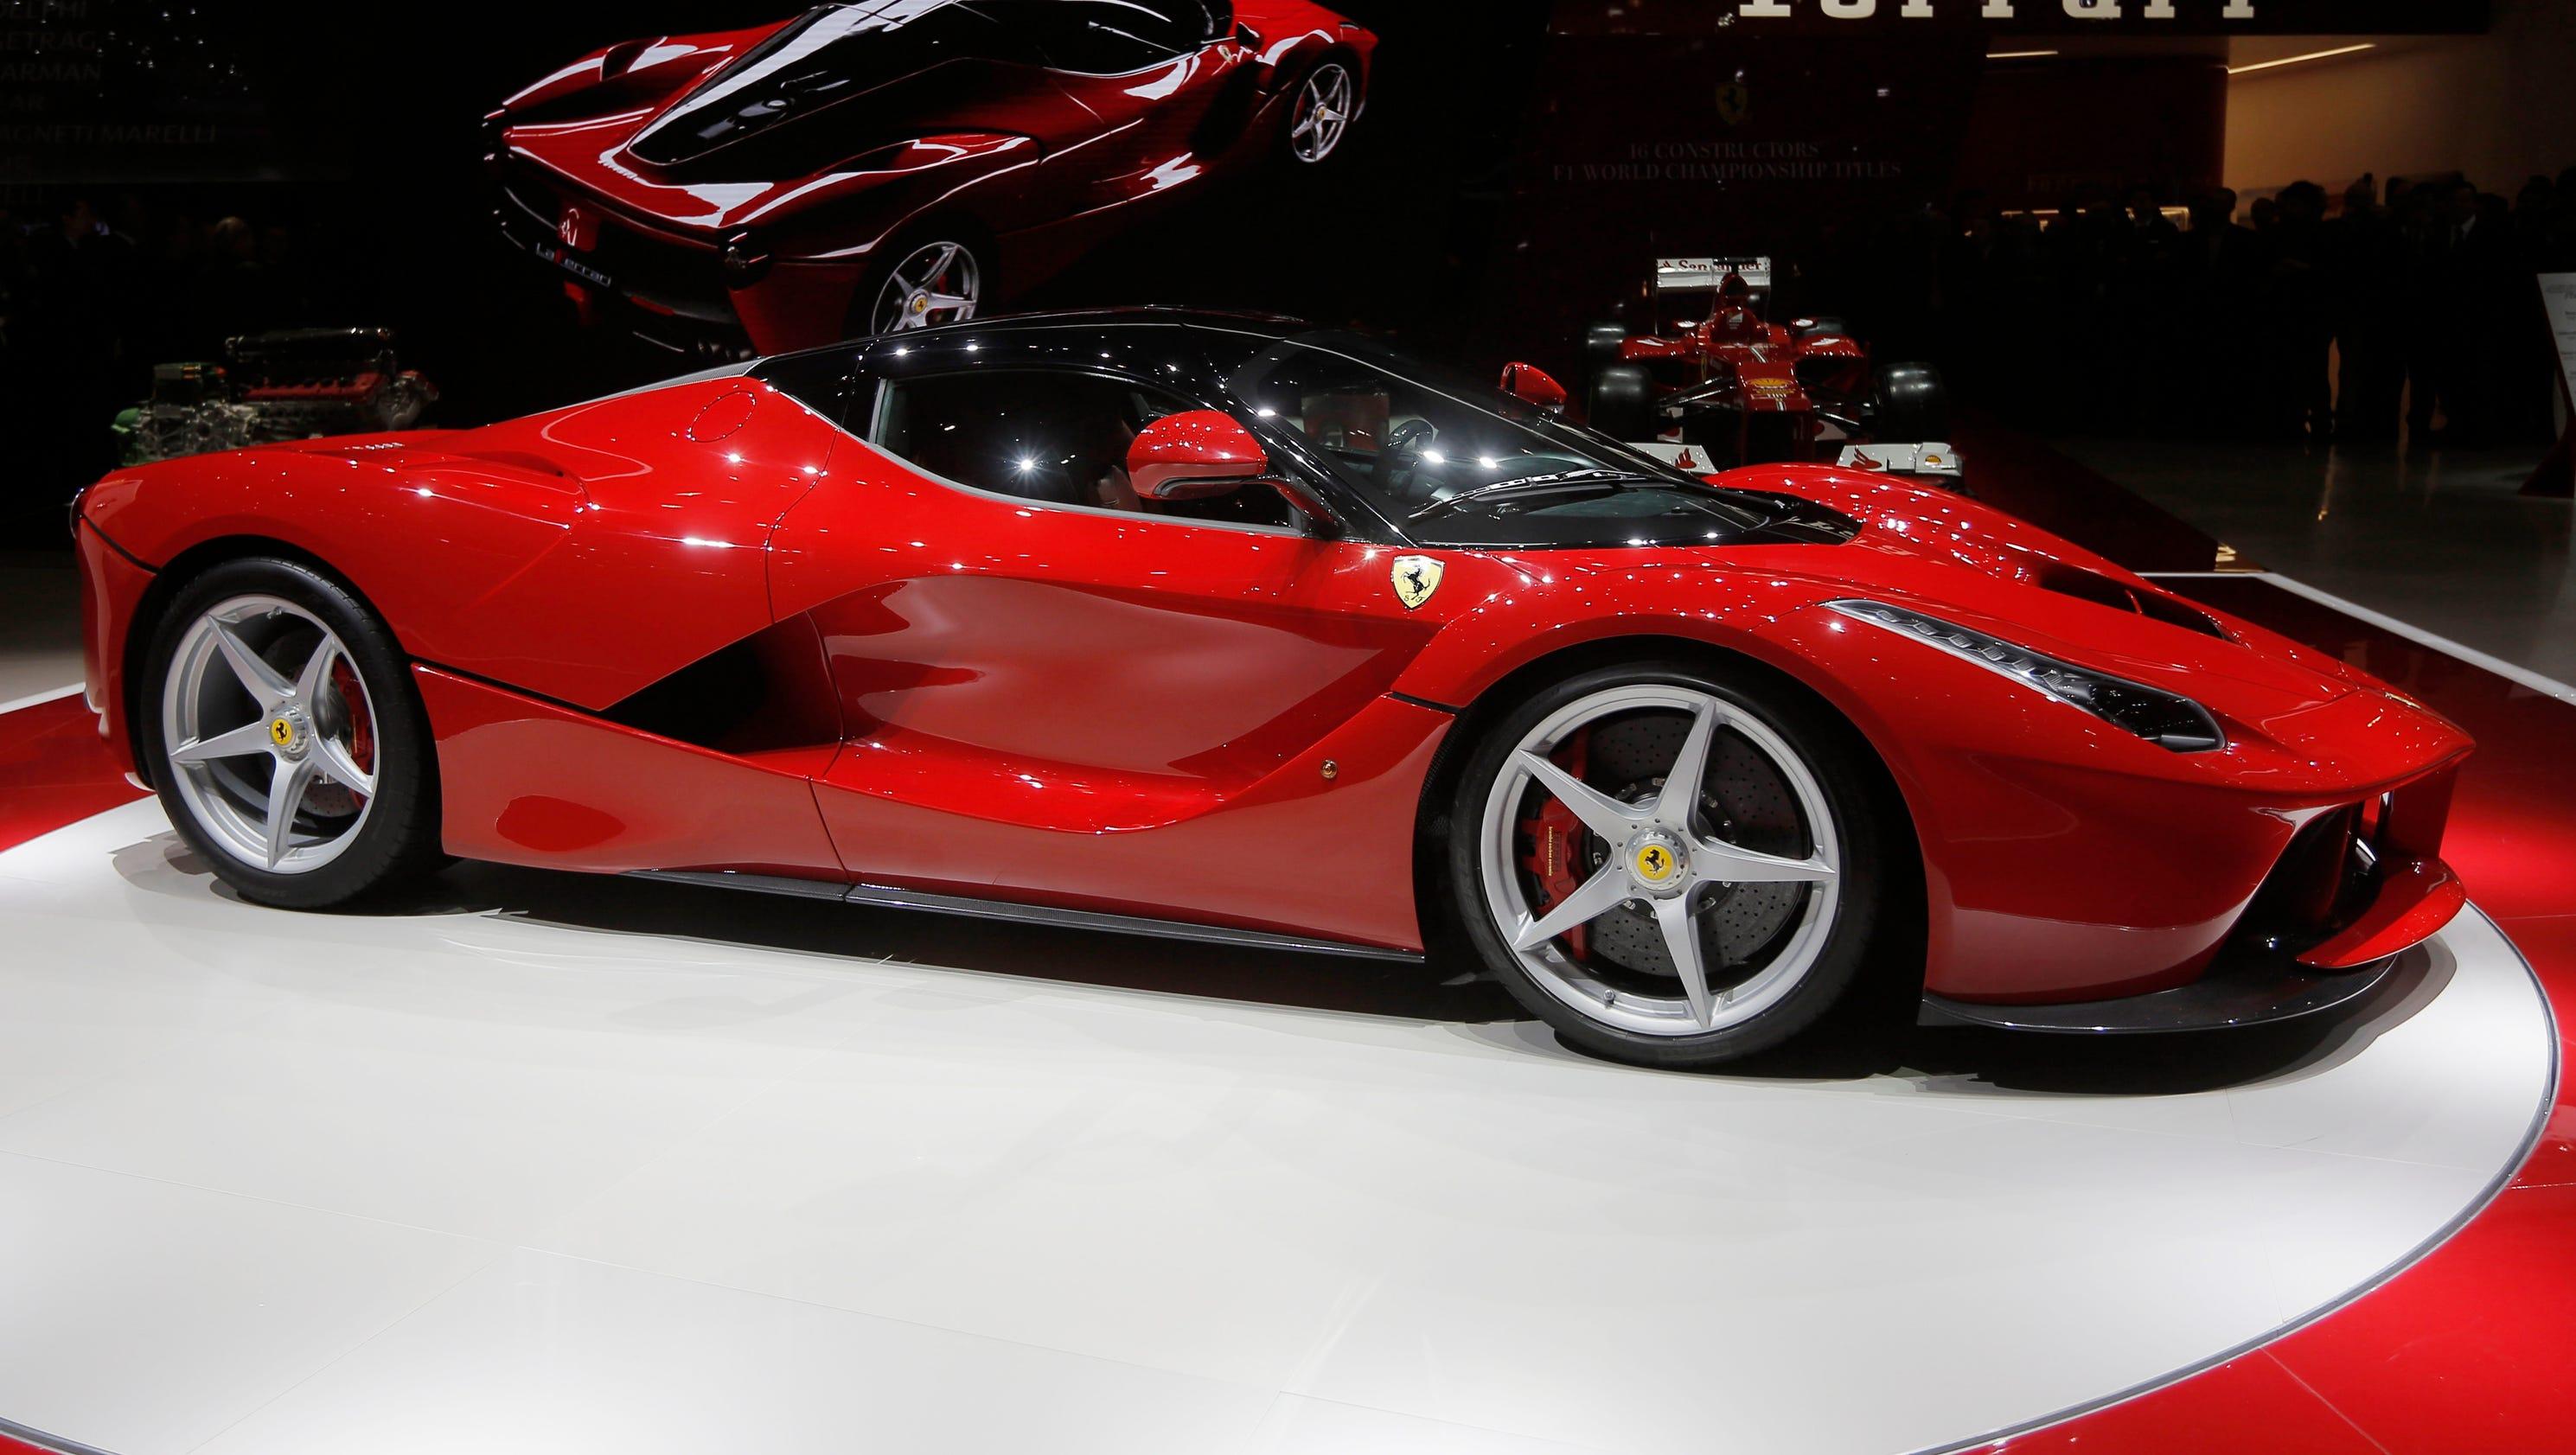 ferrari highlights nec show items insurance portfolio testarossa classic lancaster motor